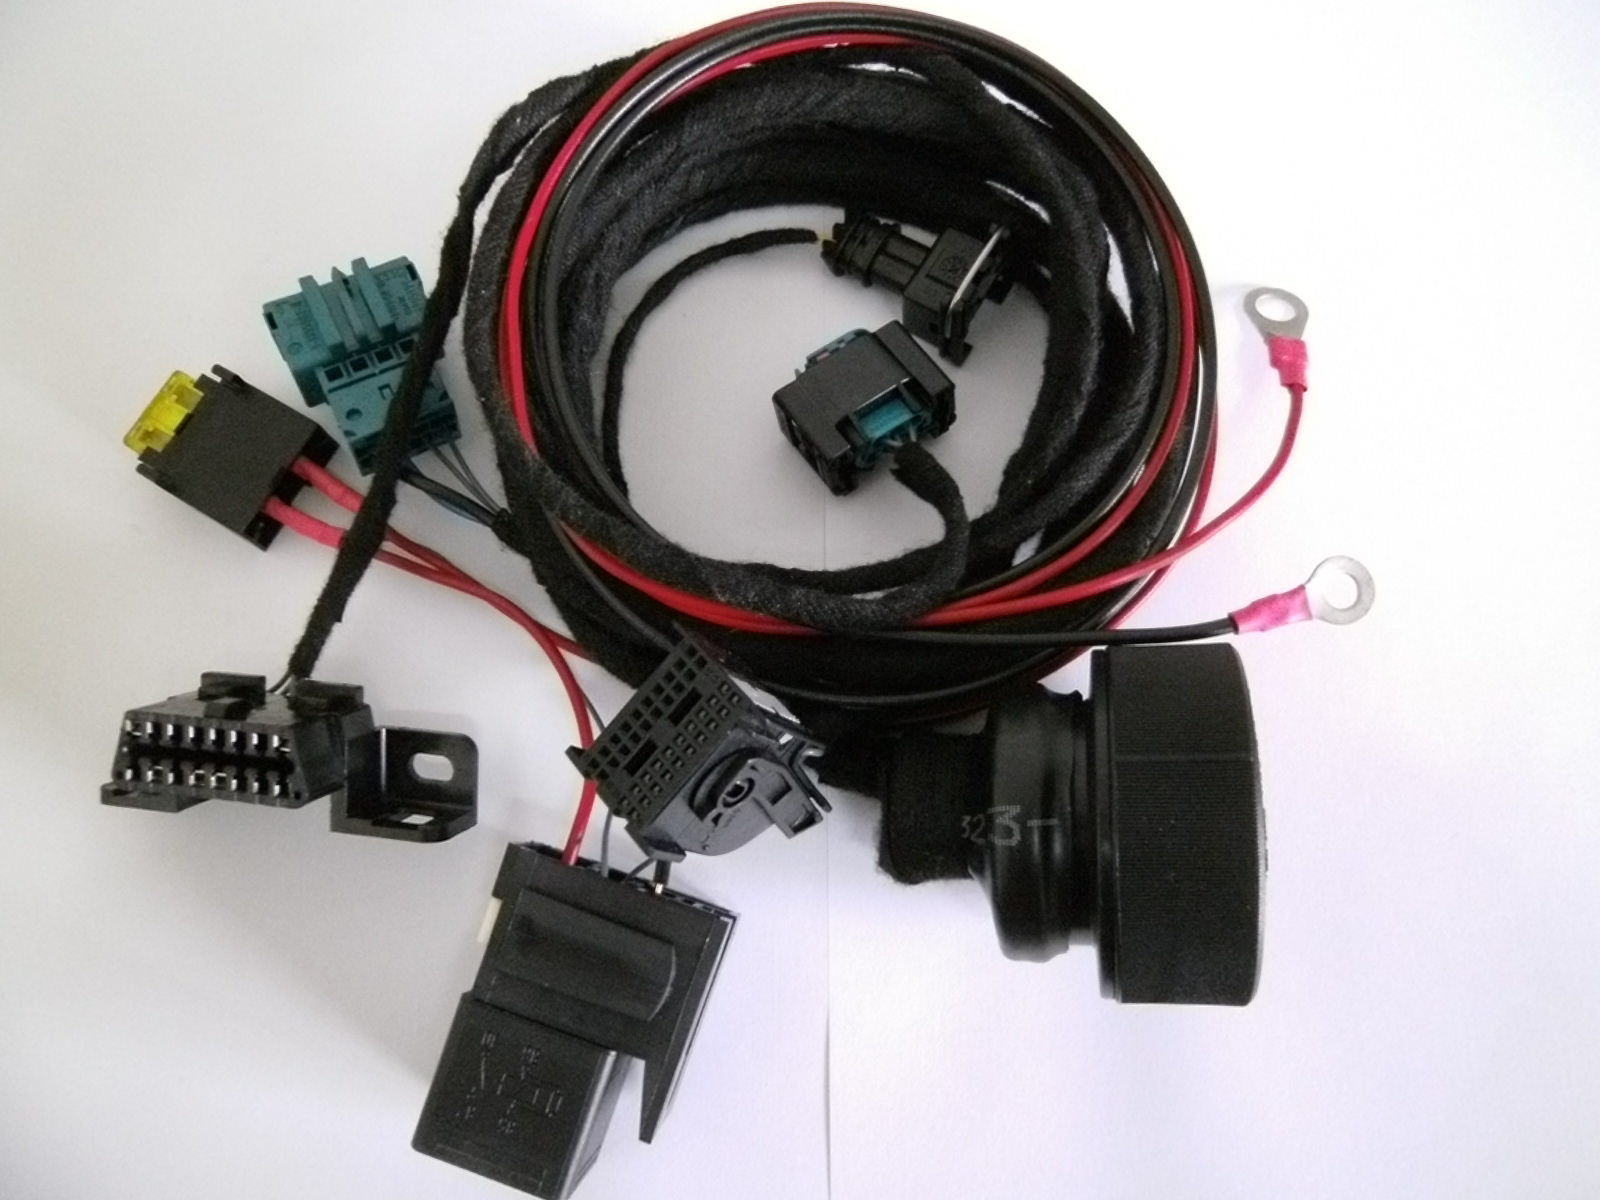 Bmw E30 Wiring Loom Good 1st Diagram John Deere 5105 M52tu M54 S54 S62 Adapter E34 E36 Z3 Hack Rh Hackengineering Co Uk 318i Harness